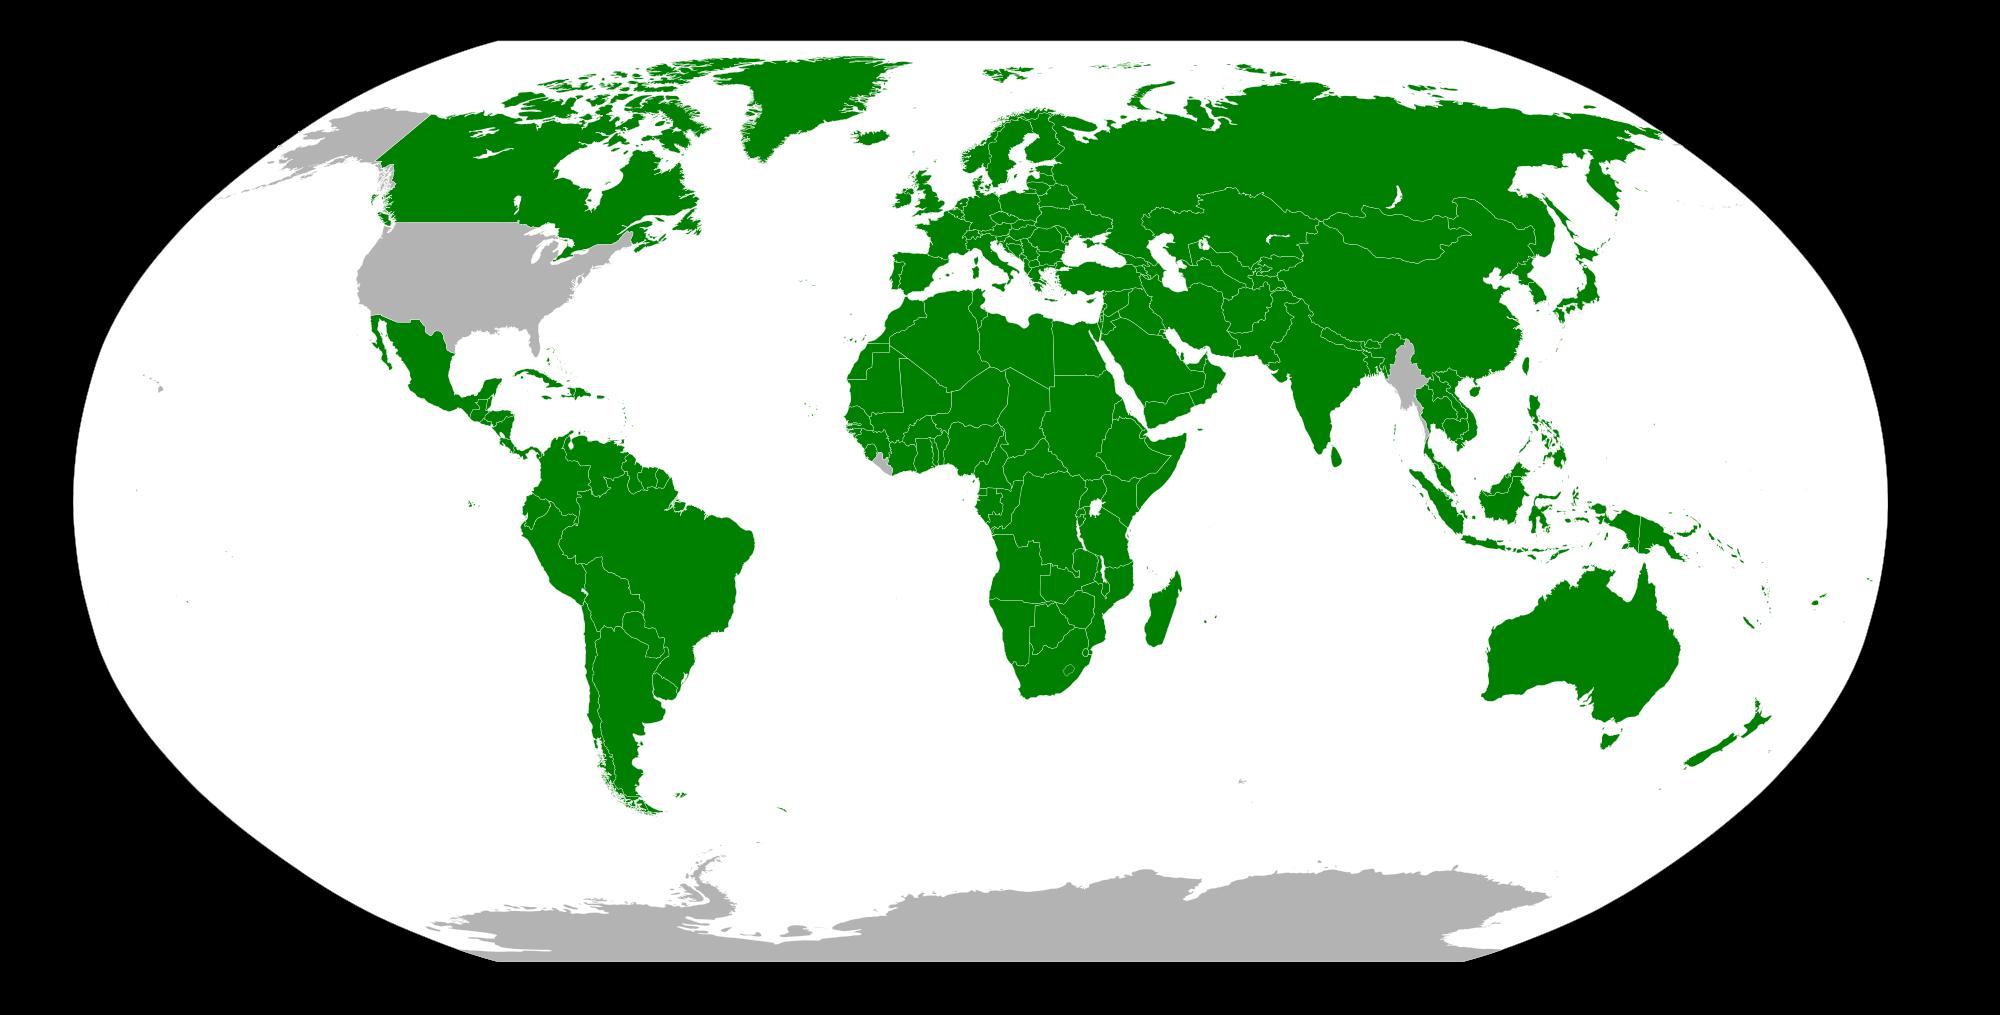 Países em verde usam o sistema métrico